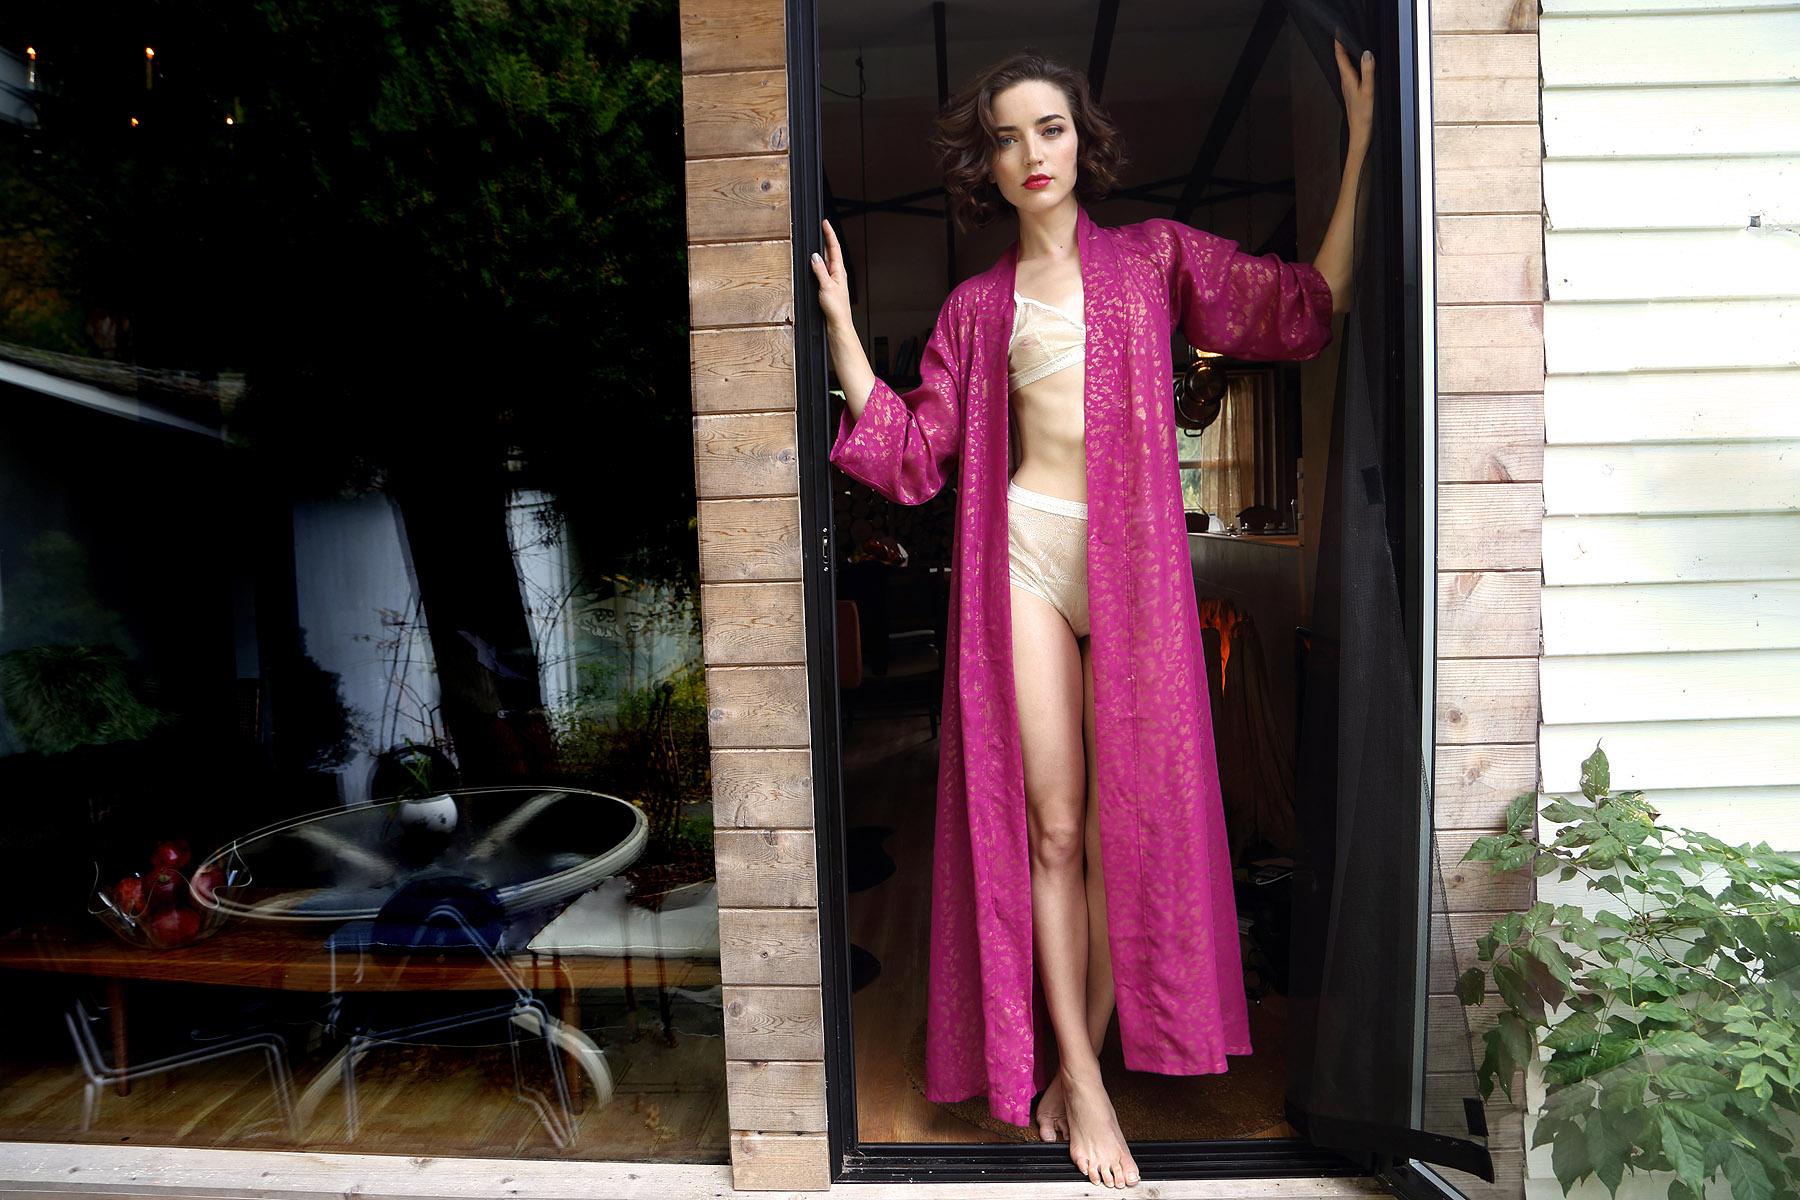 holiday-14-bts-lingerie-lookbook-raspberry-pink-gold-robe-porch-2.jpg